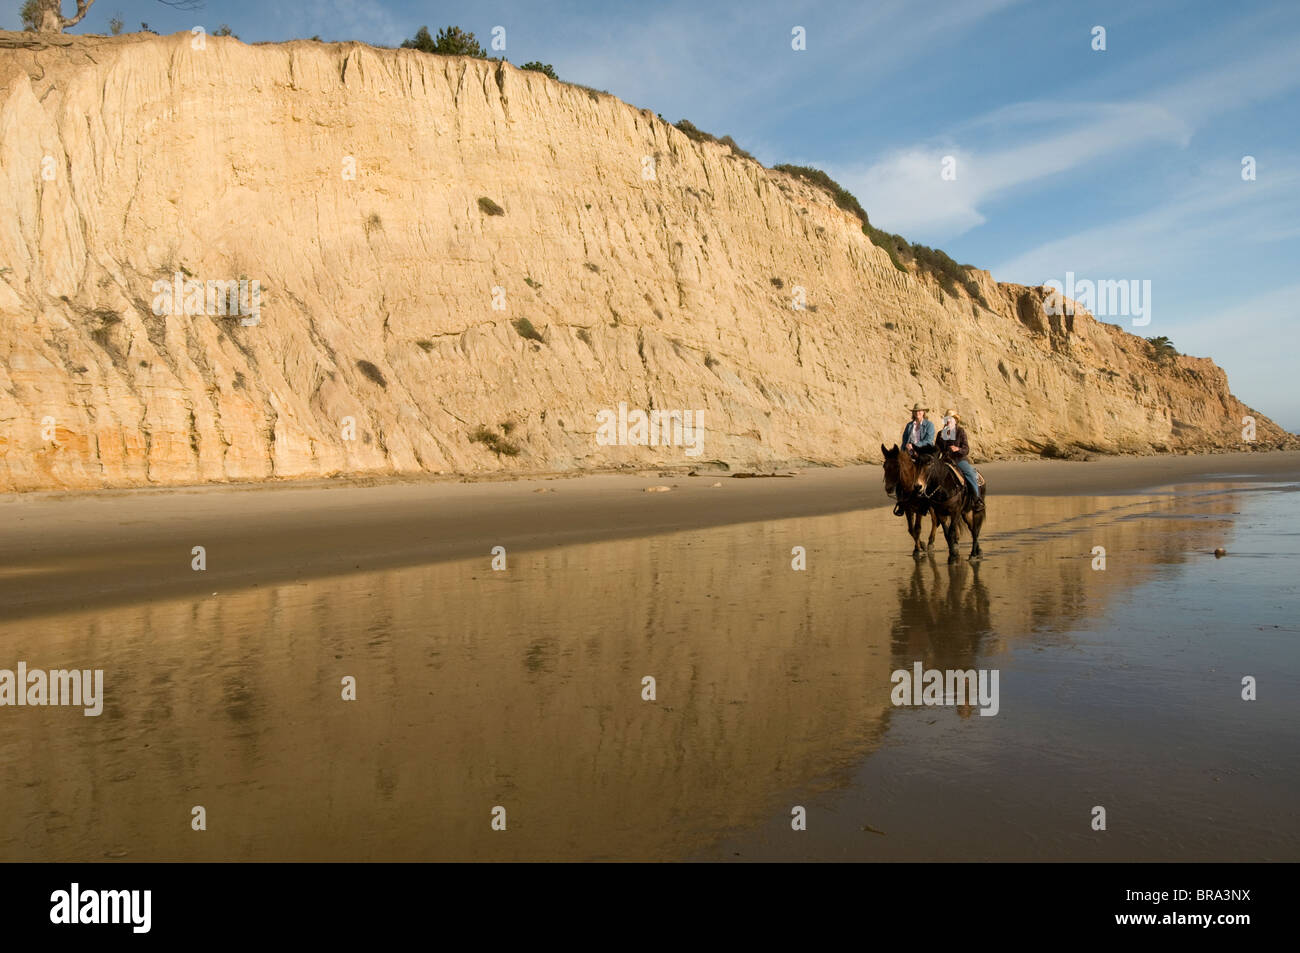 Les cavaliers Mule col cliffs sur plage de Summerland Santa Barbara  California coast Central USA 8f9c7a041dff